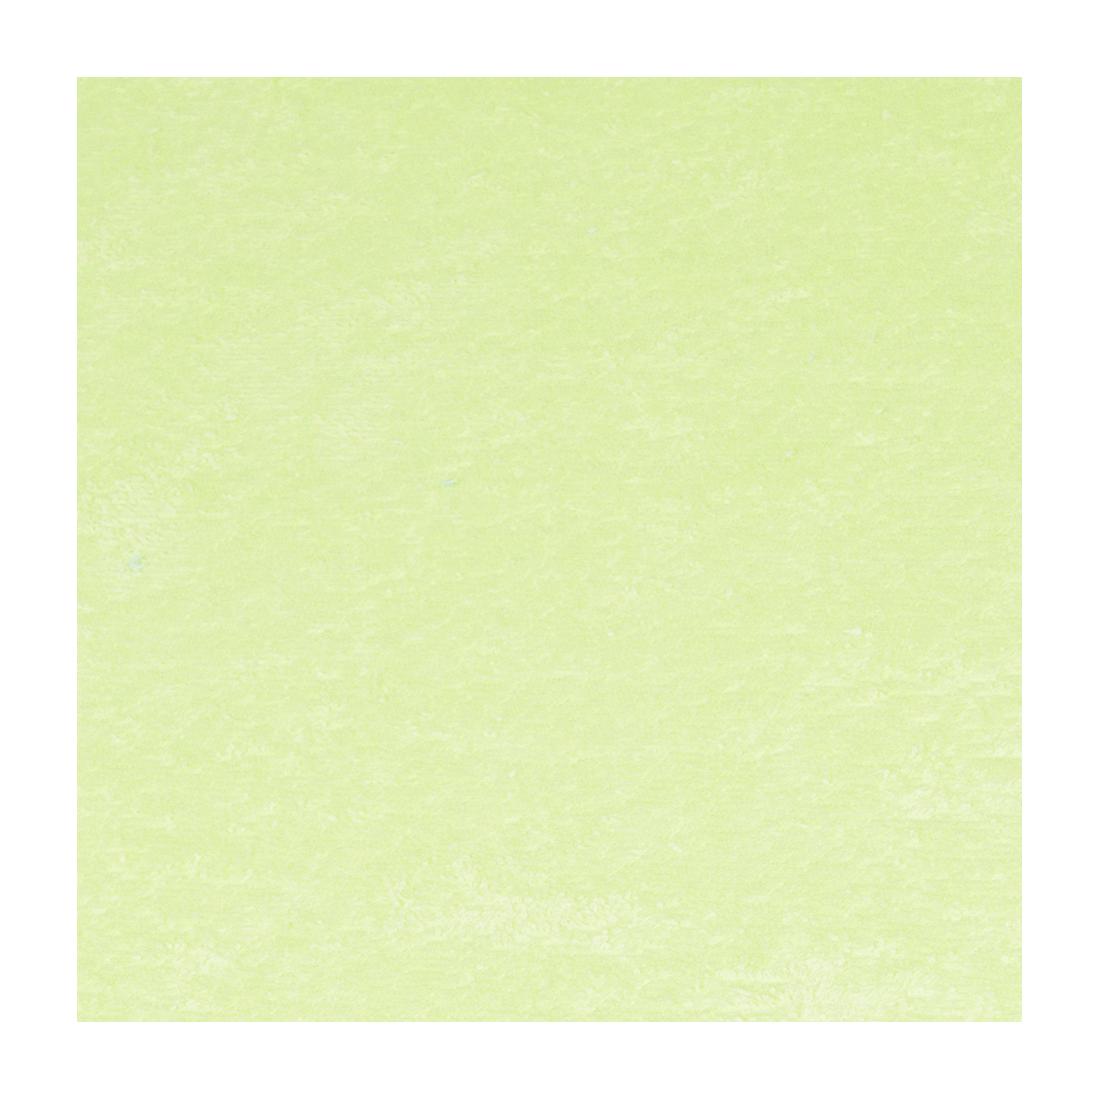 NP froté válec BA/EPS 15x40 Z, zelená